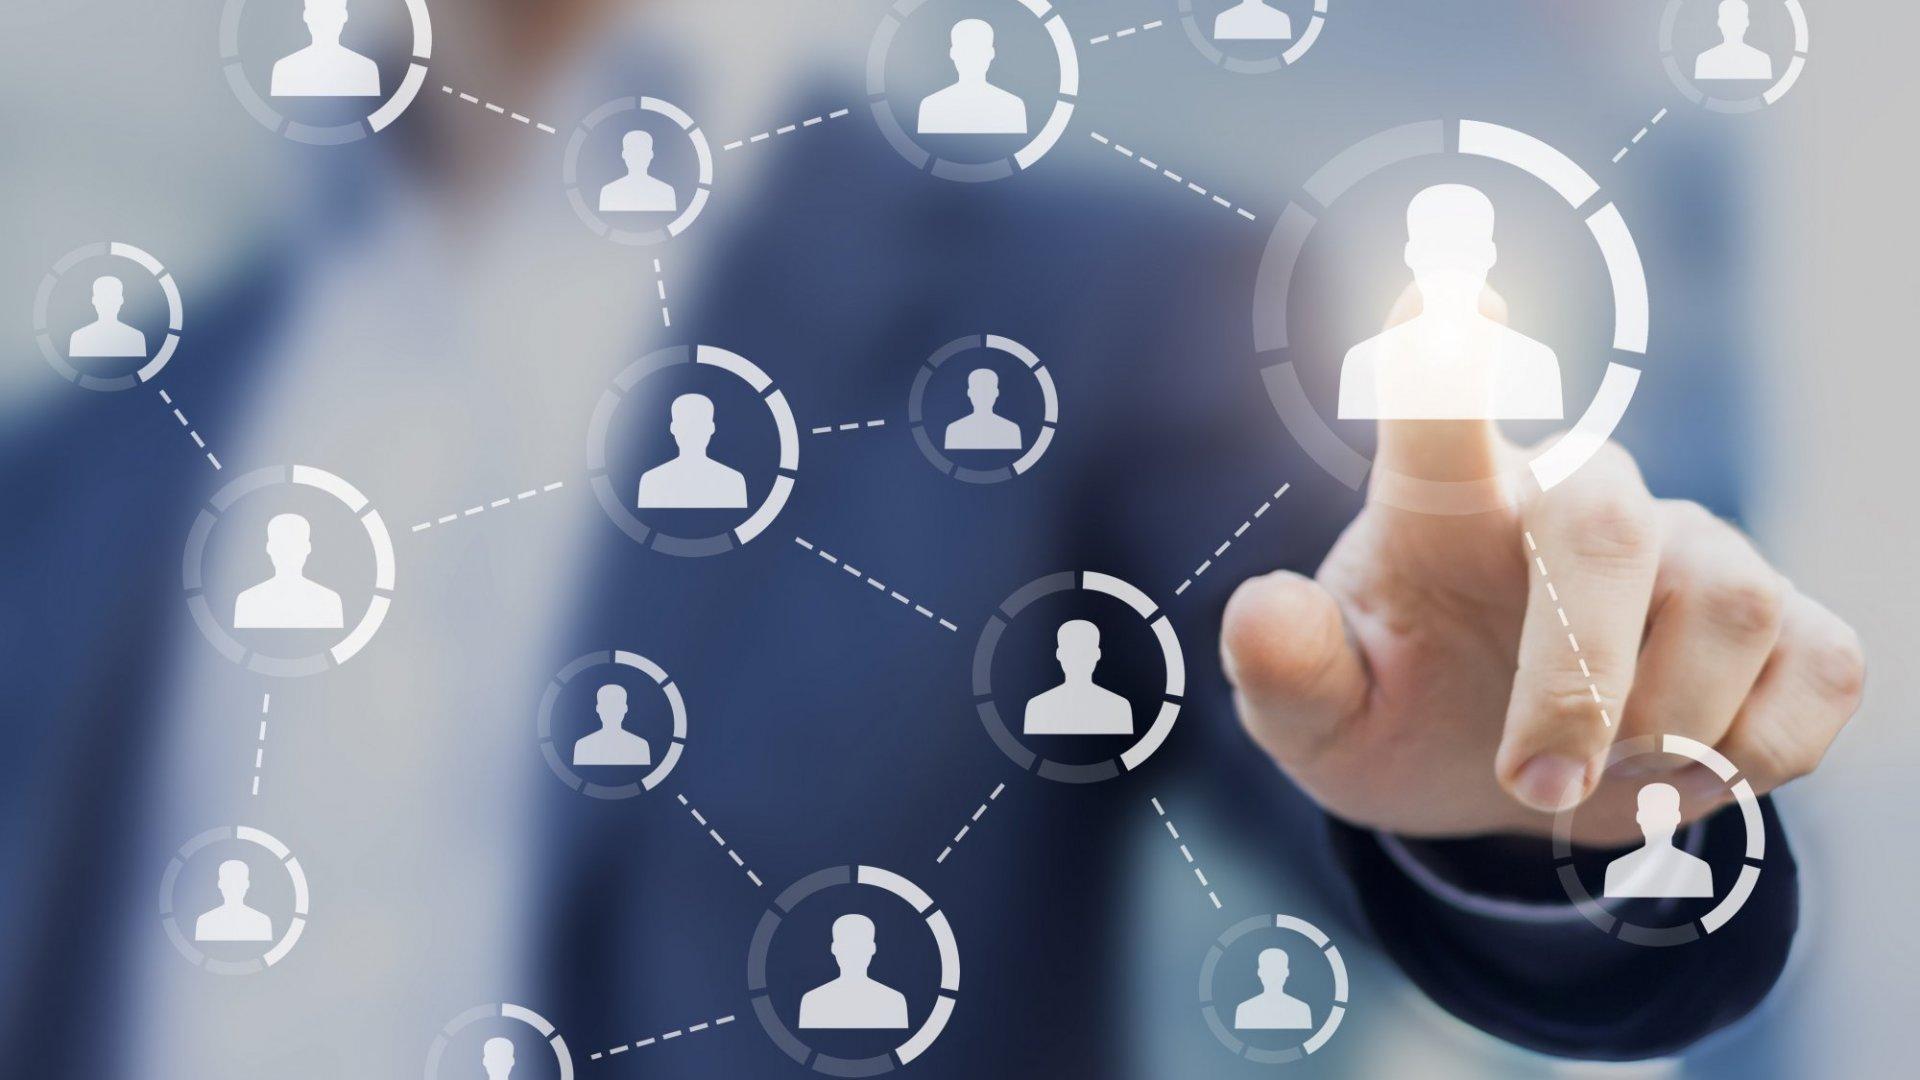 5 Lead Generation Strategies for Social Media